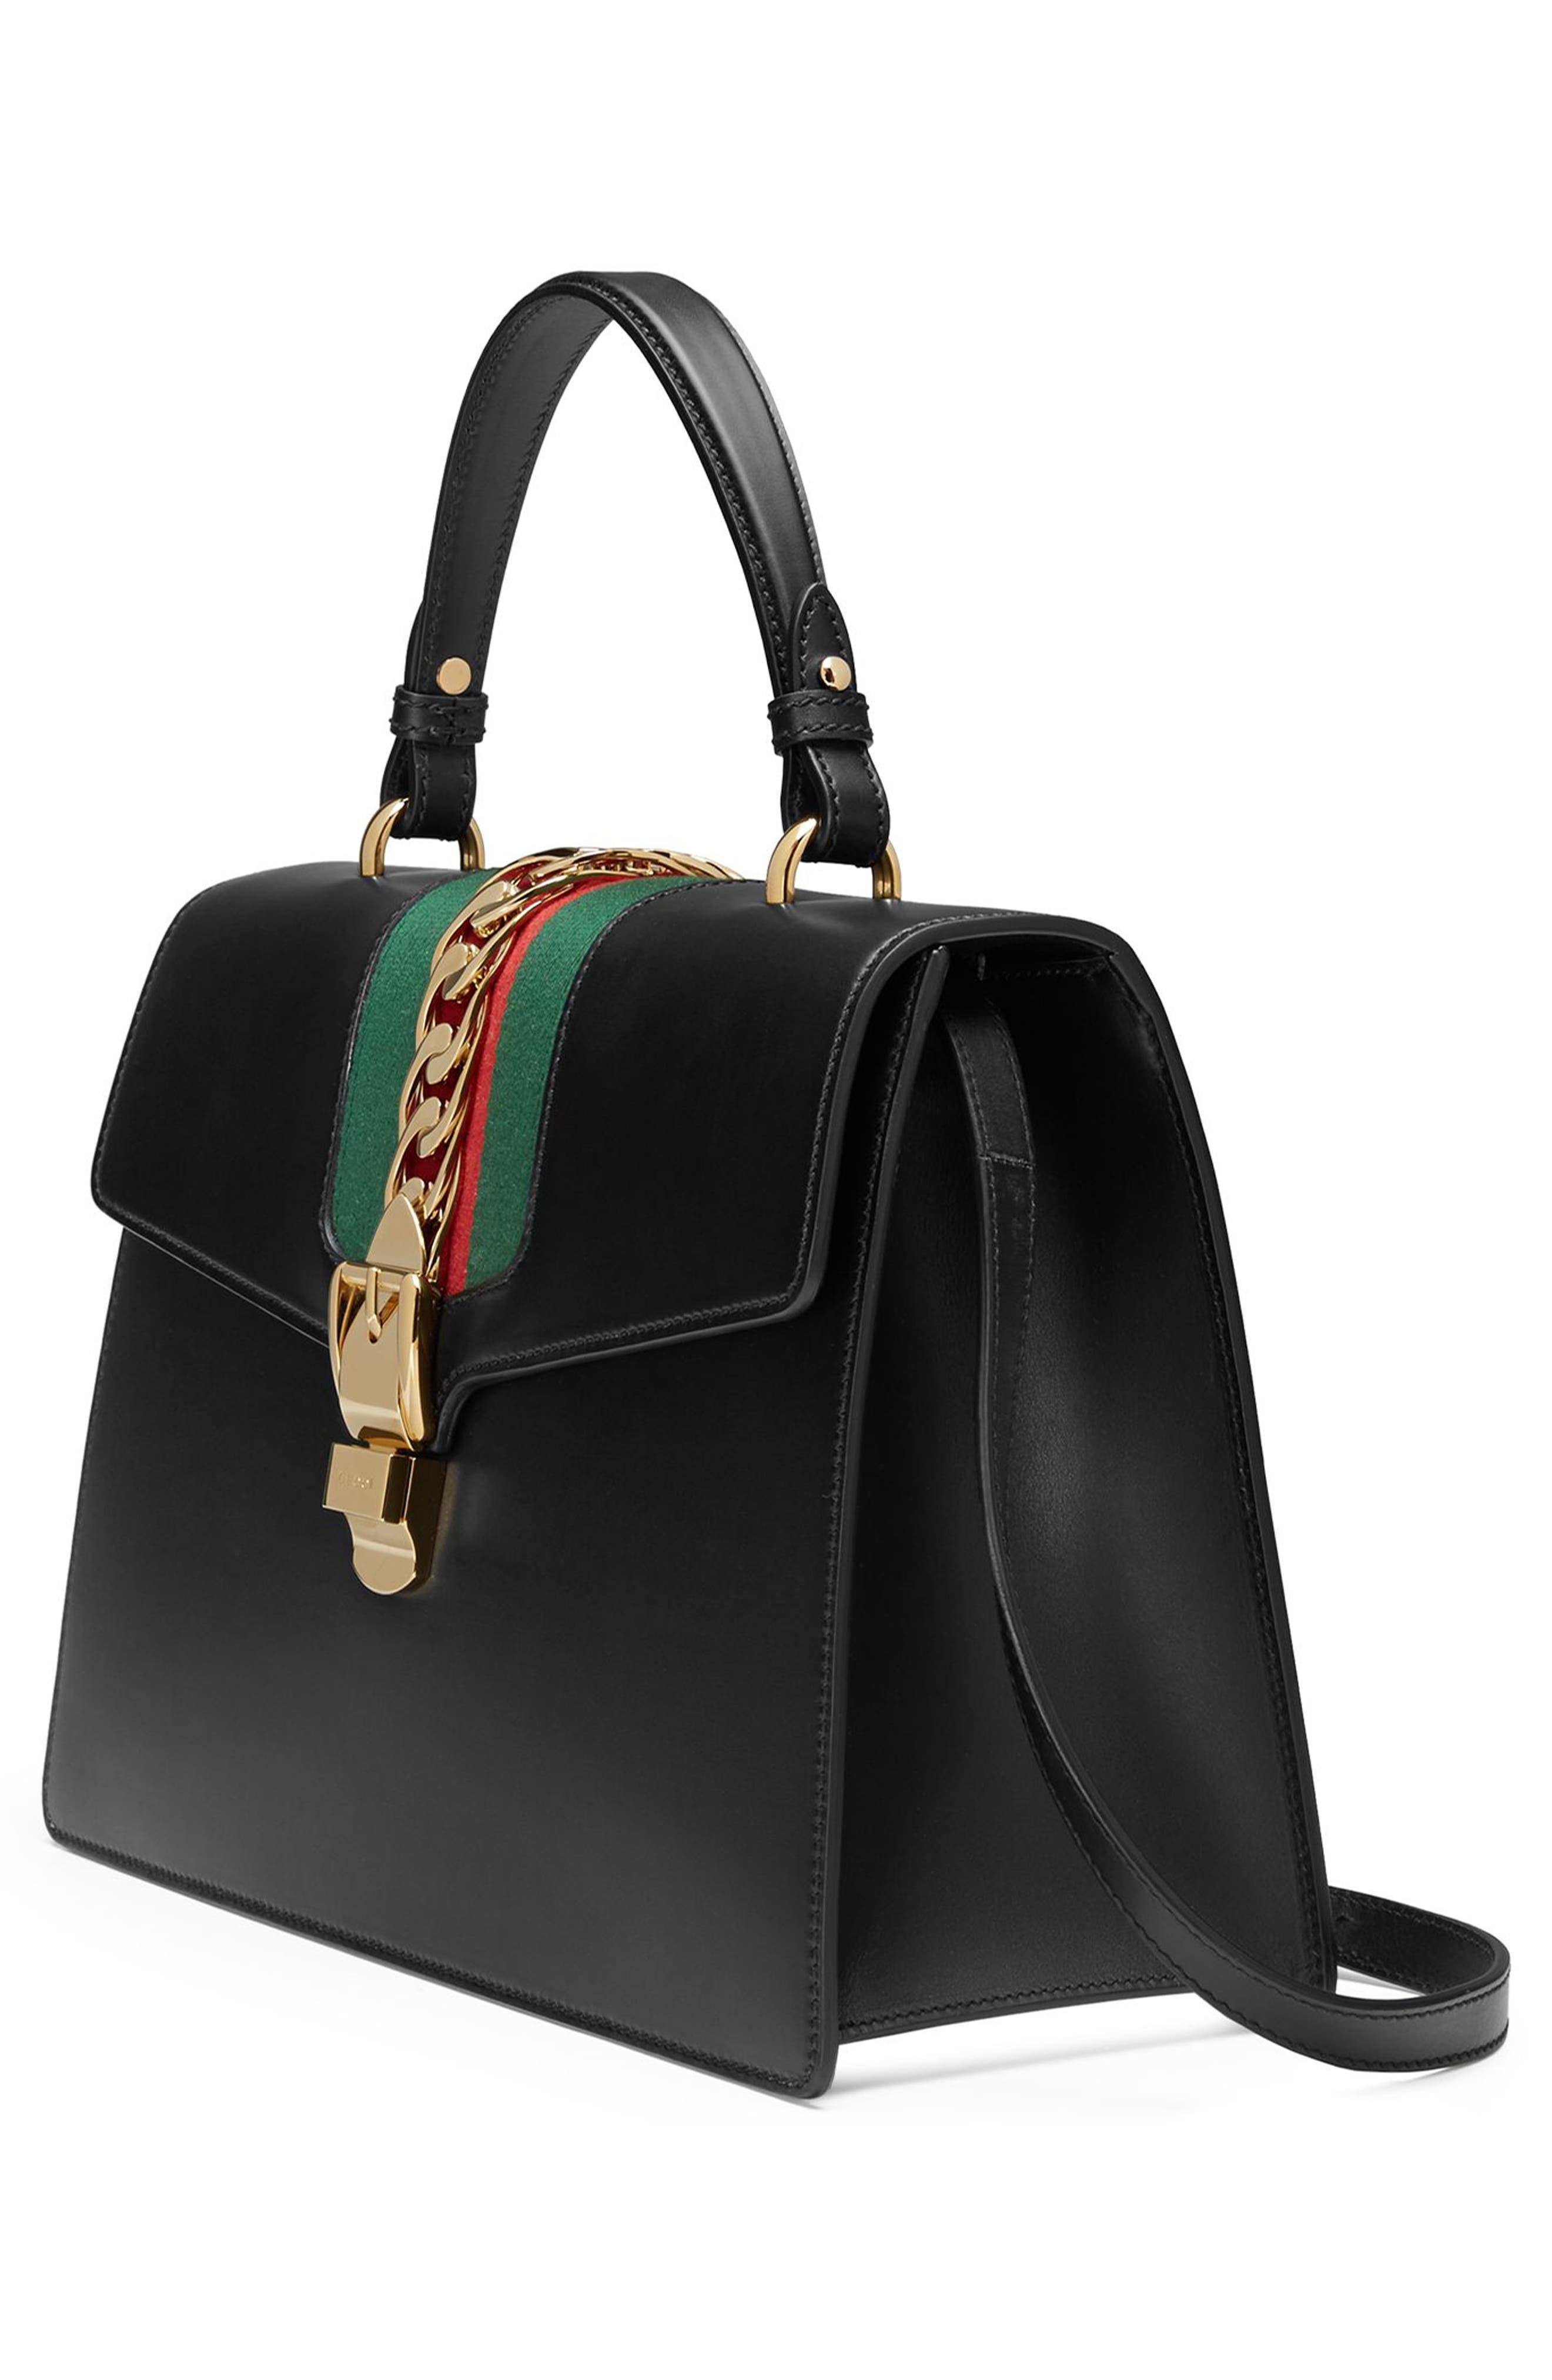 Sylvie Top Handle Leather Shoulder Bag,                             Alternate thumbnail 4, color,                             NERO/VRV